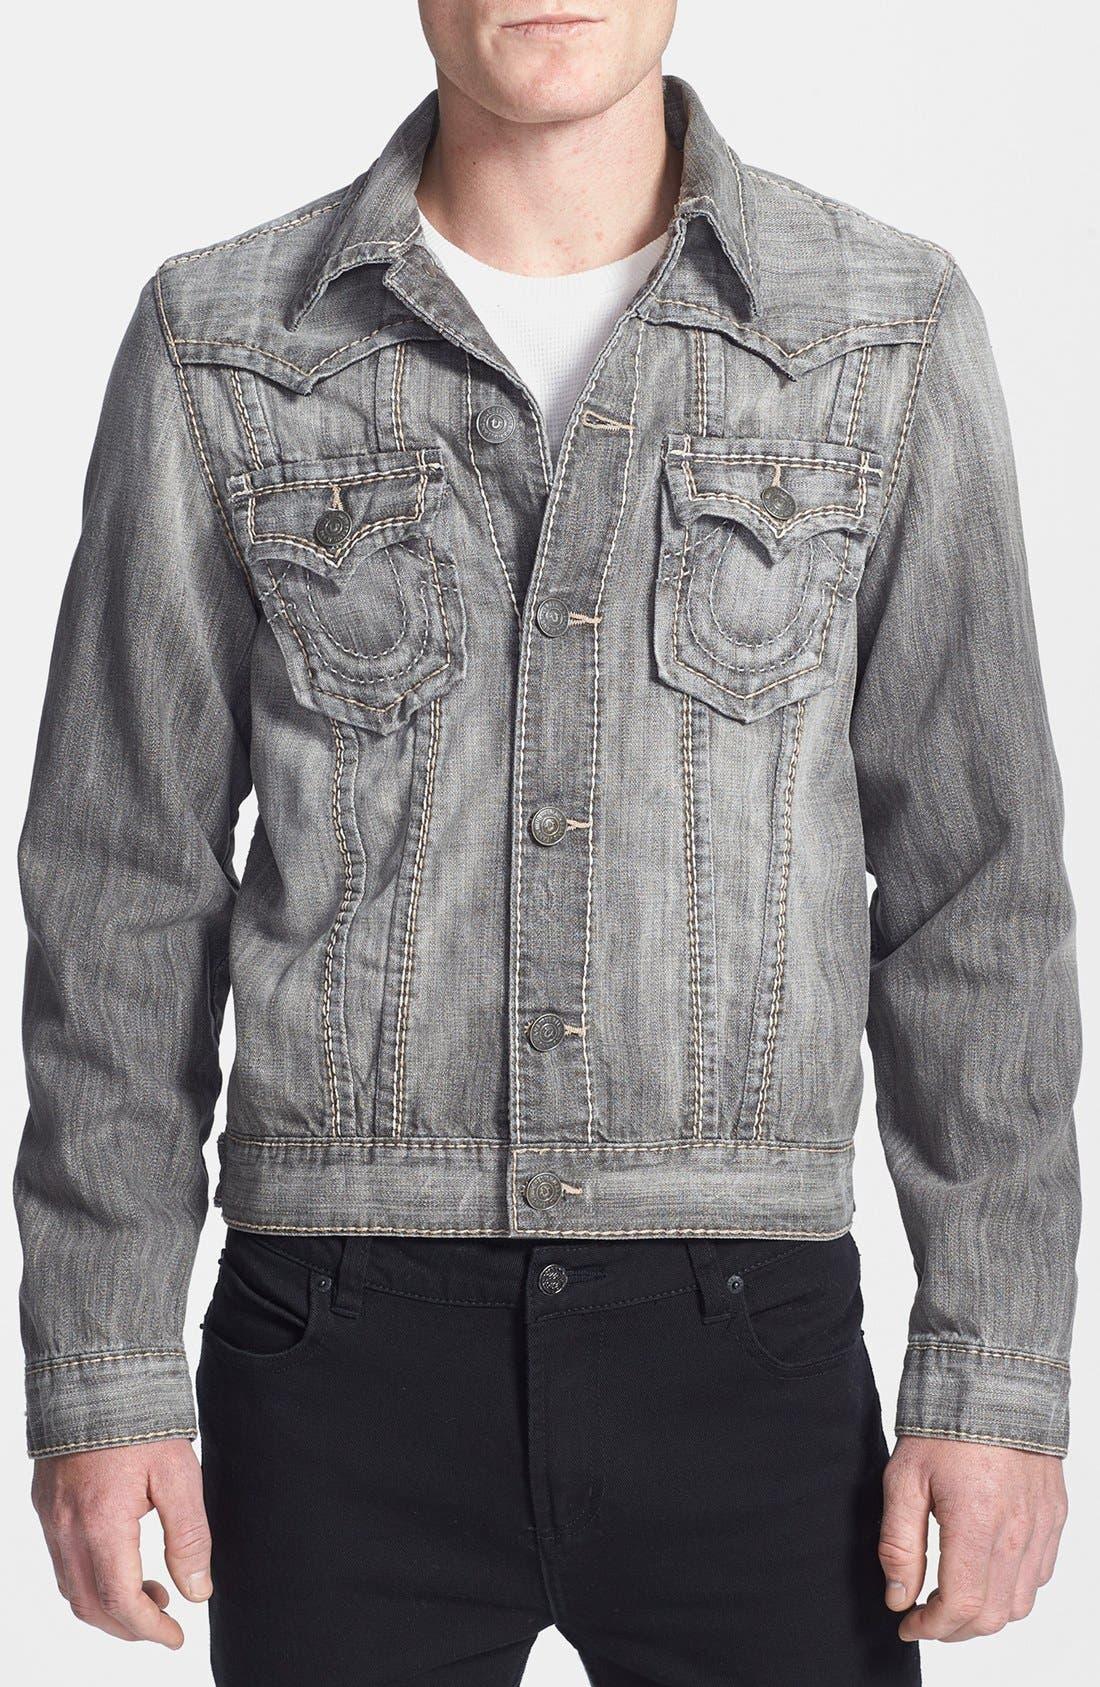 Alternate Image 1 Selected - True Religion Brand Jeans 'Jimmy Big T' Denim Jacket